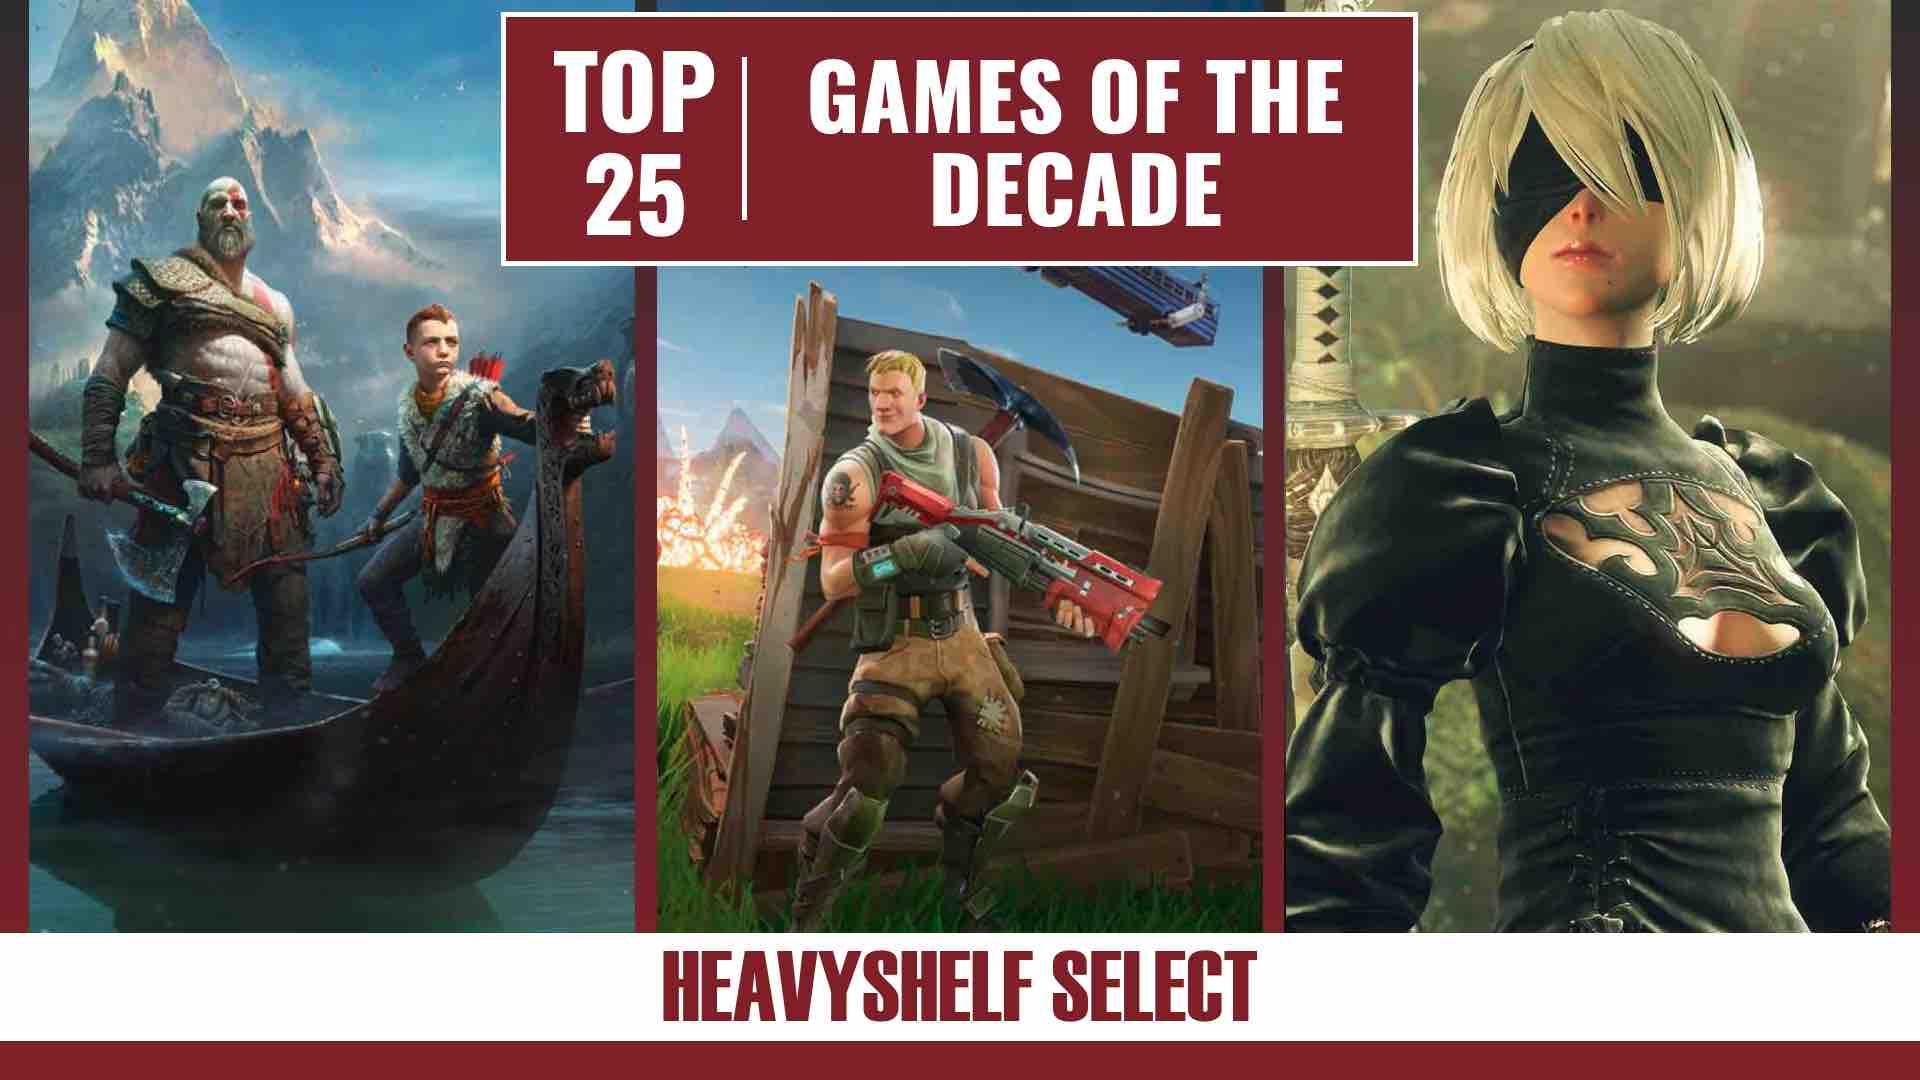 Top 25 Games of the Decade (2010-2019)   Heavyshelf Select